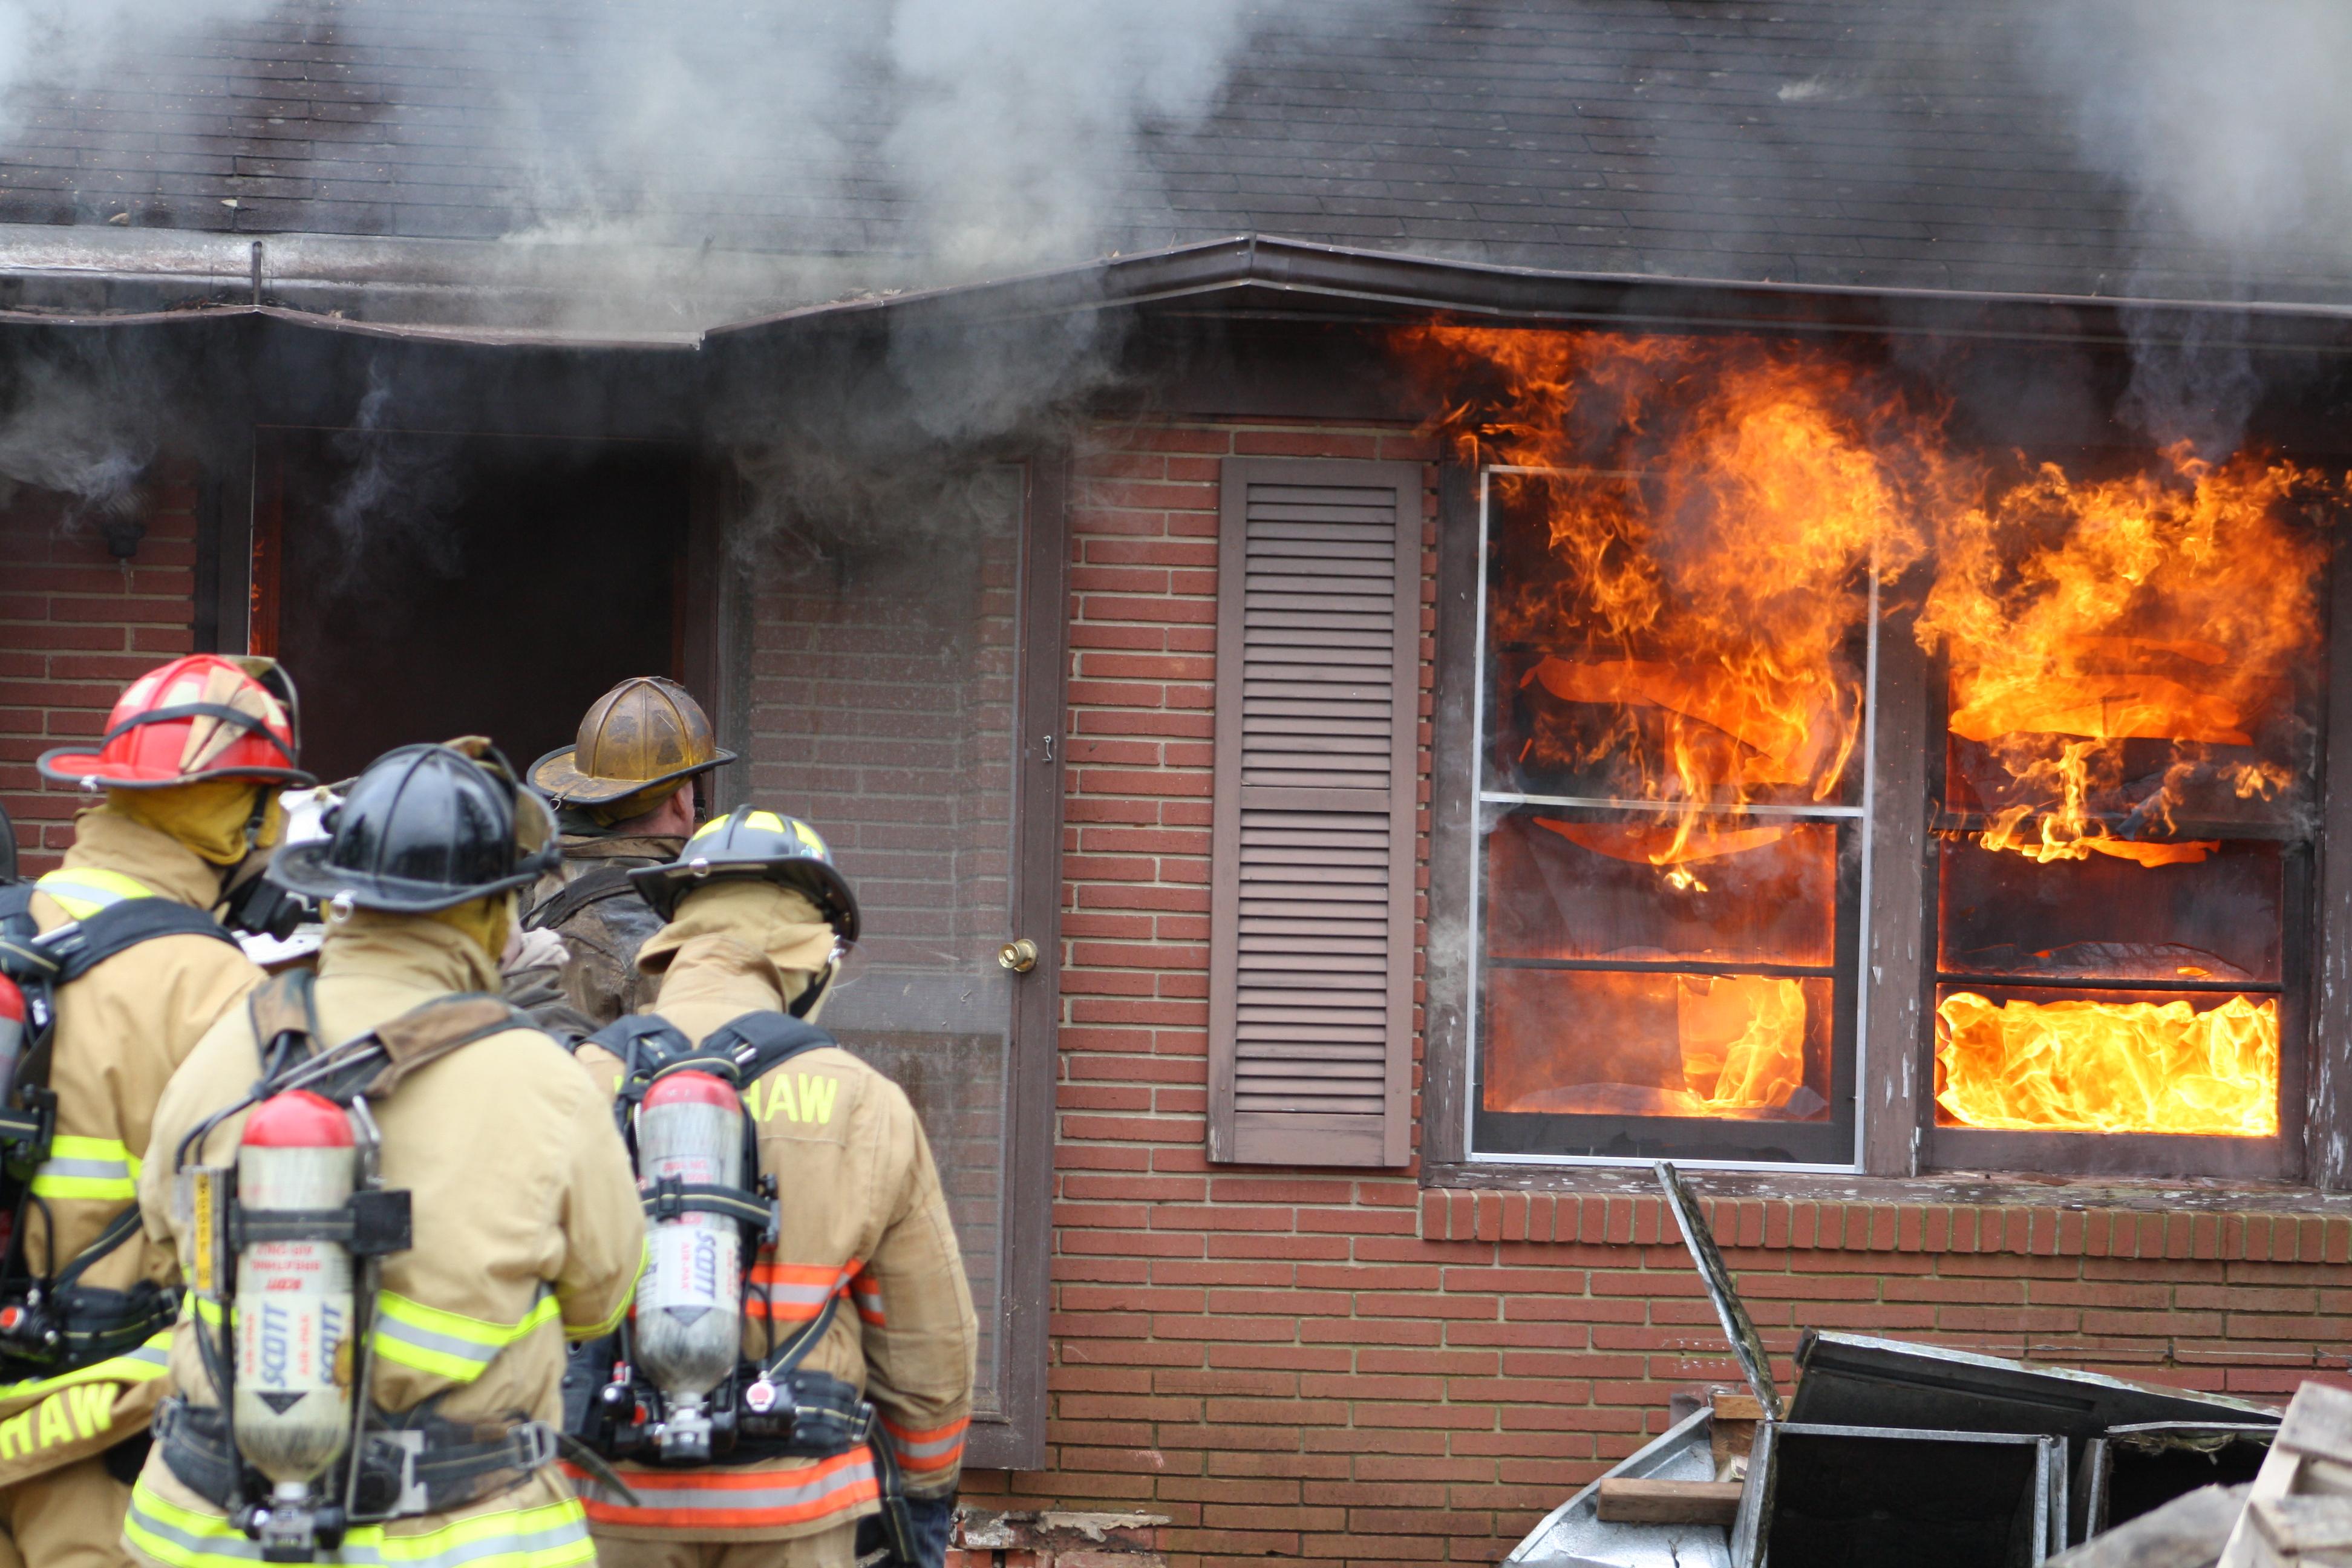 Firefighter Certification & Tactics